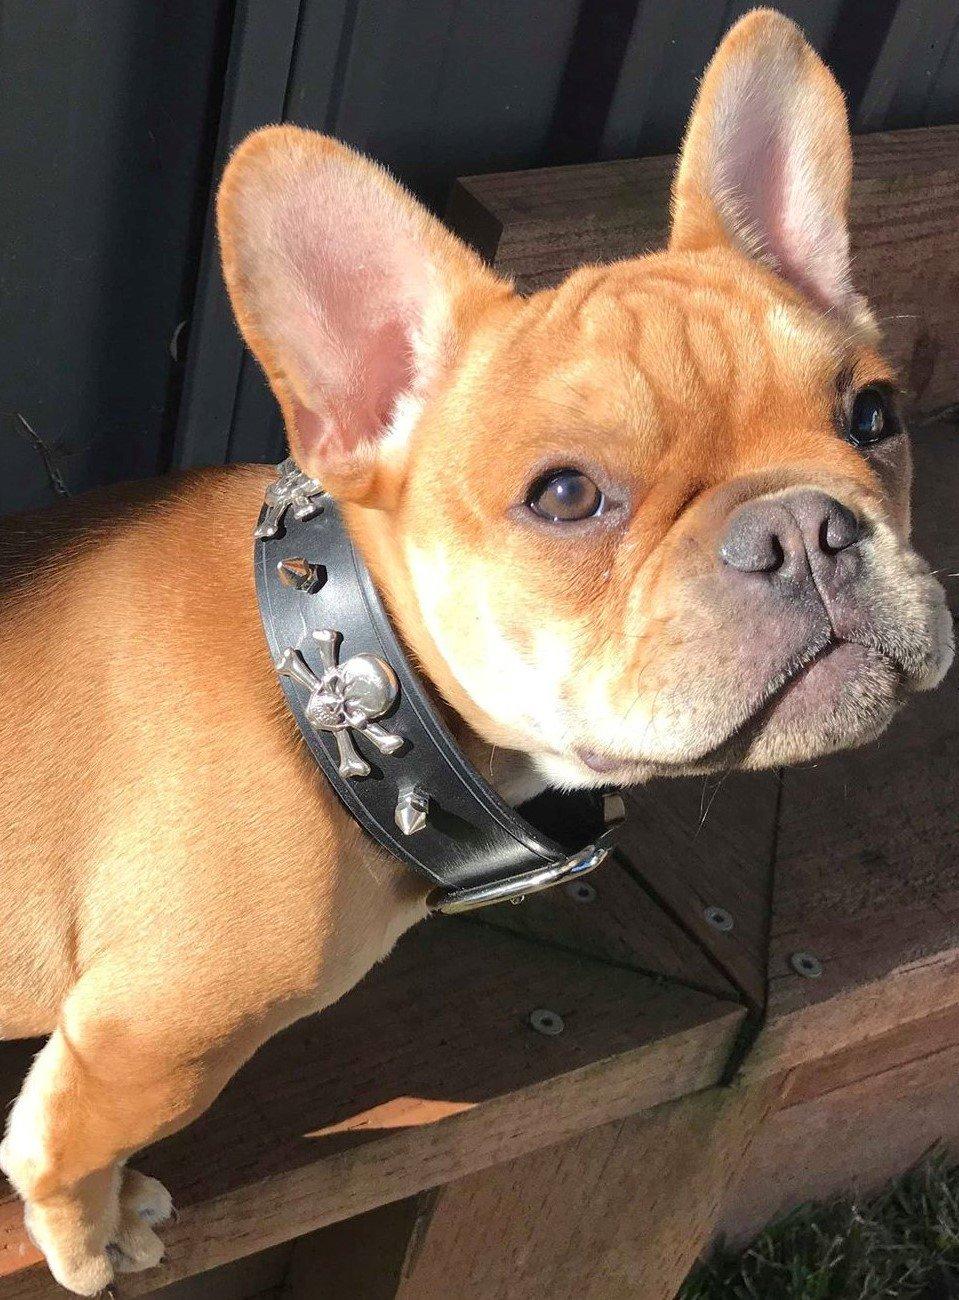 Make a Belt or Dog Collar 9/10